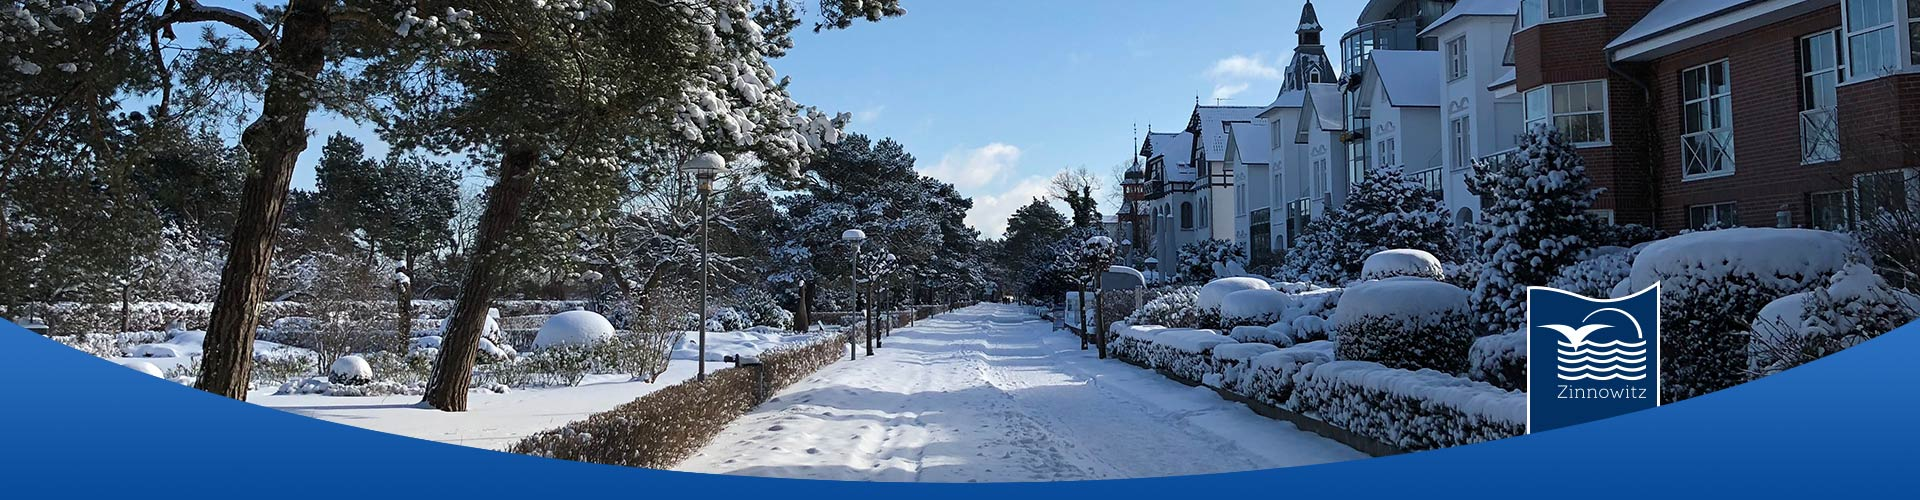 Promenade Ostseebad Zinnowitz Winter